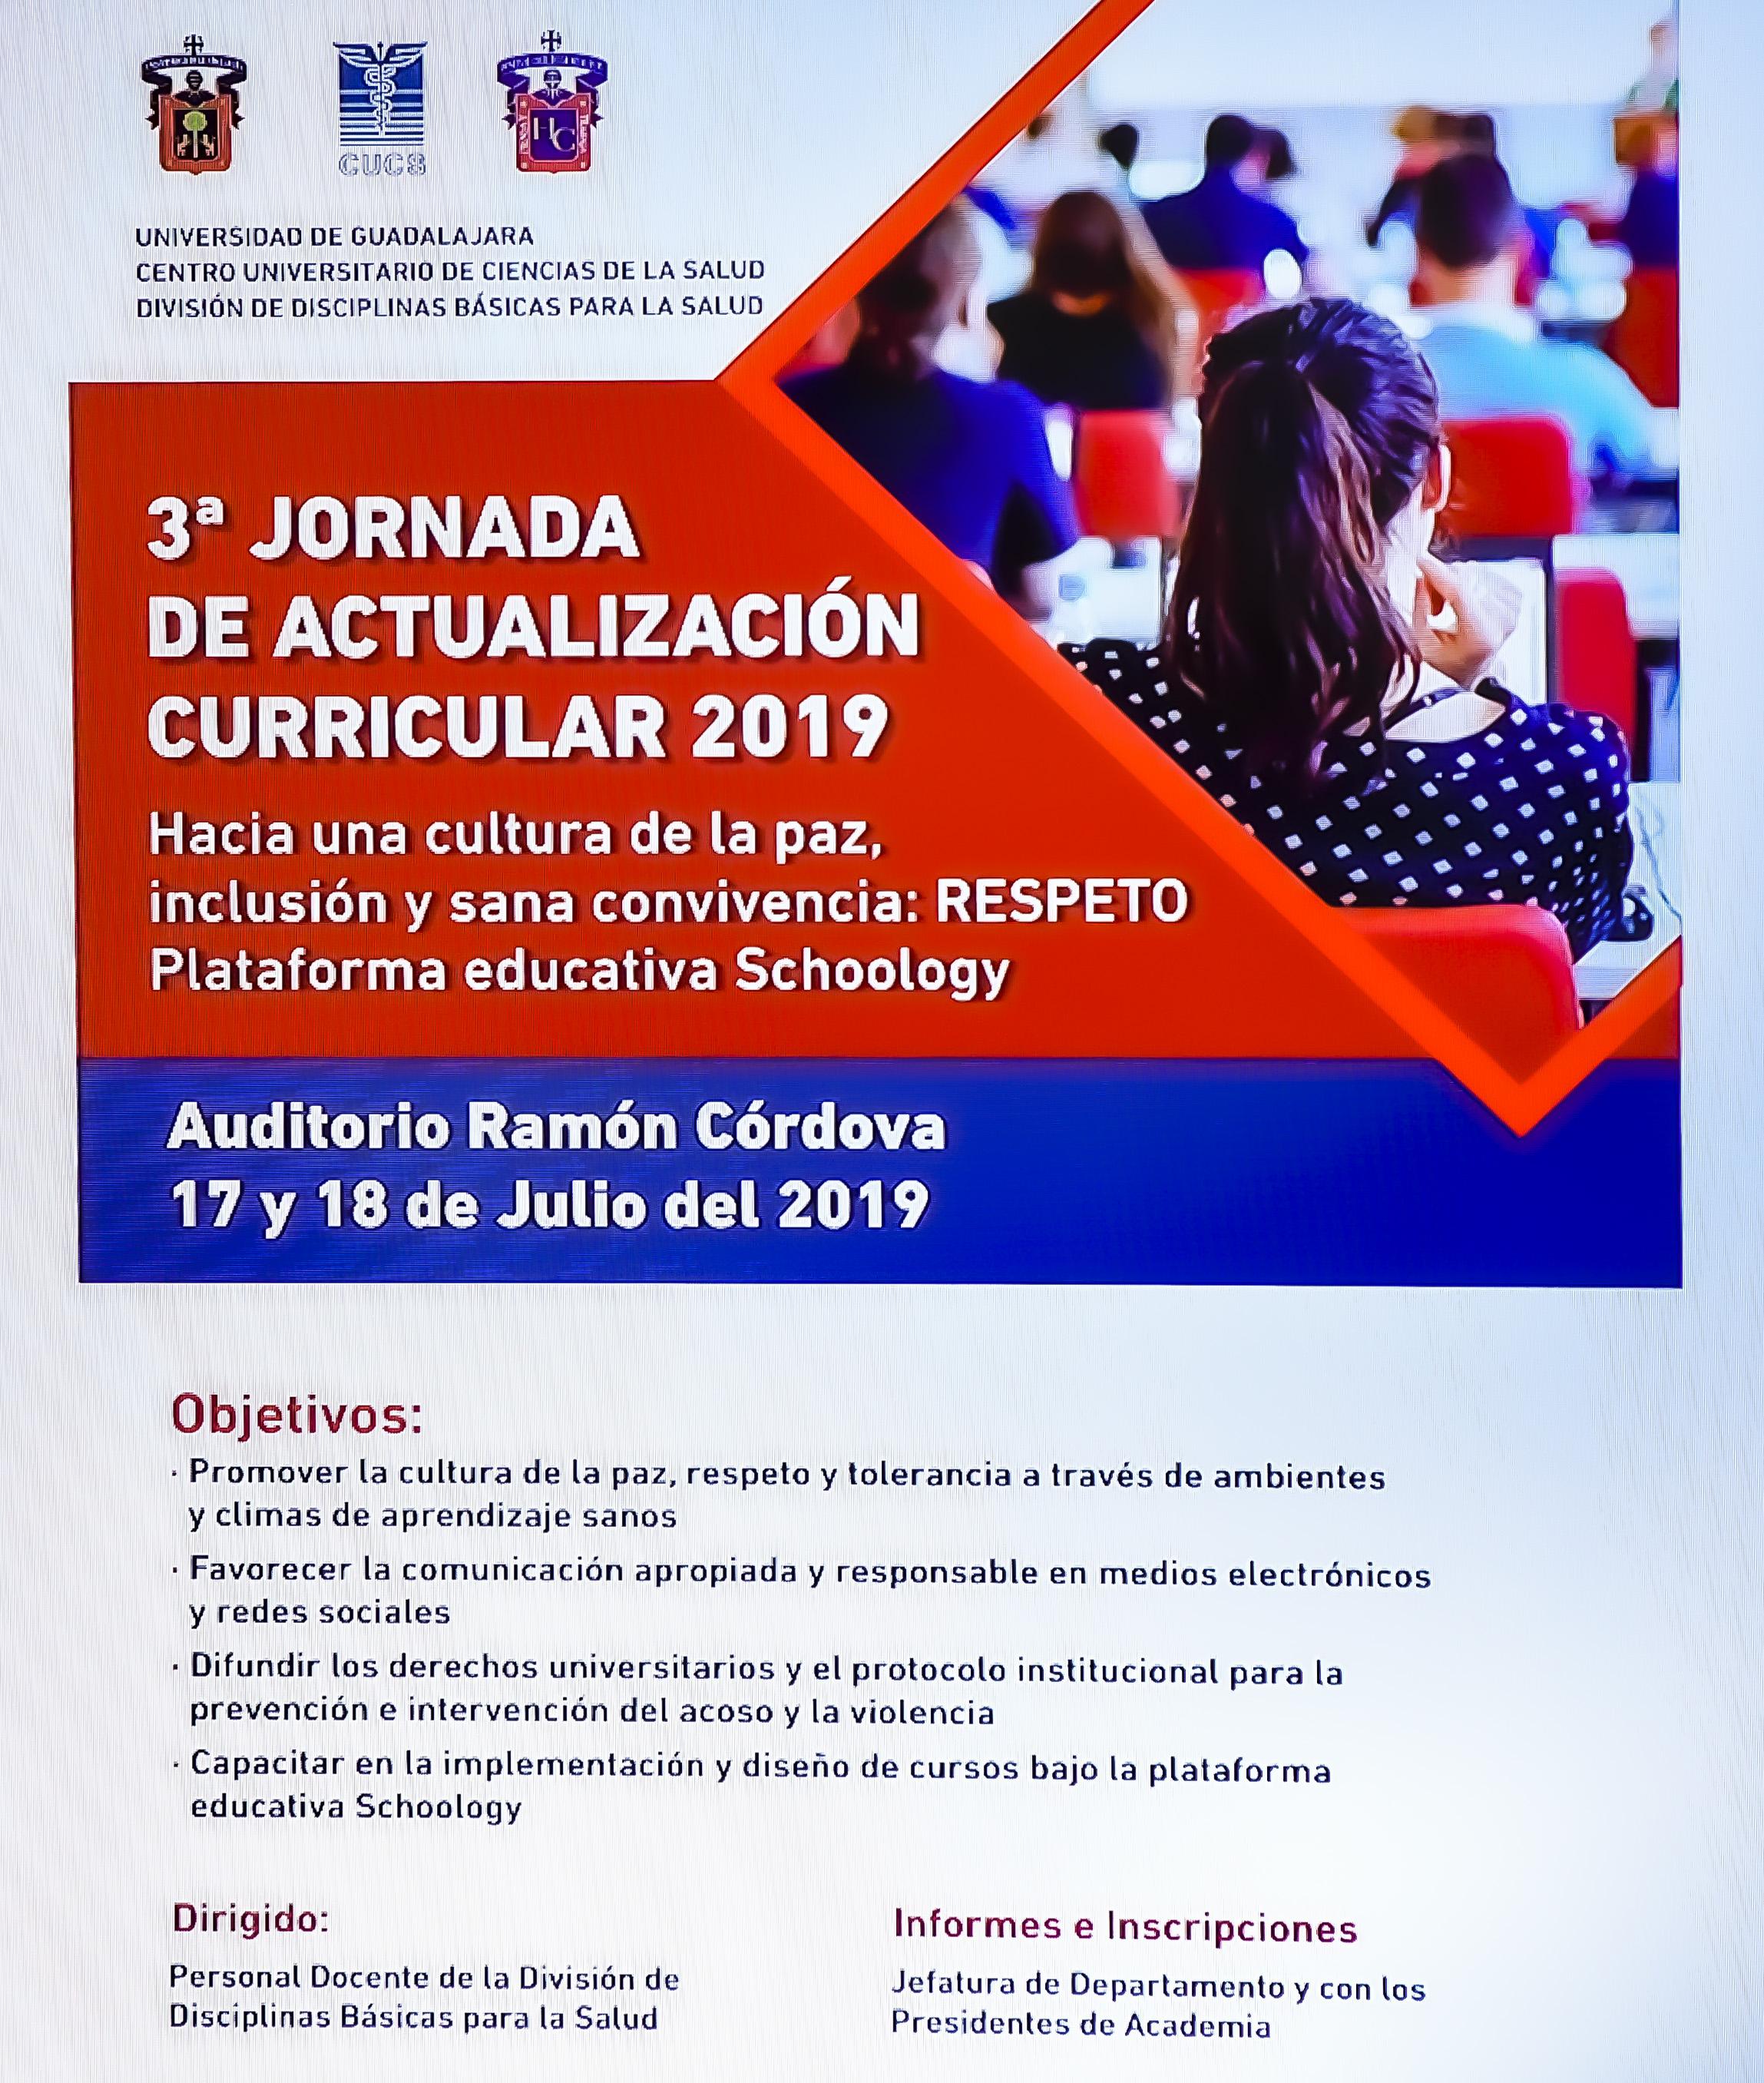 Cartel promocional de la 3a. Jornada Académica de Actualización Curricular